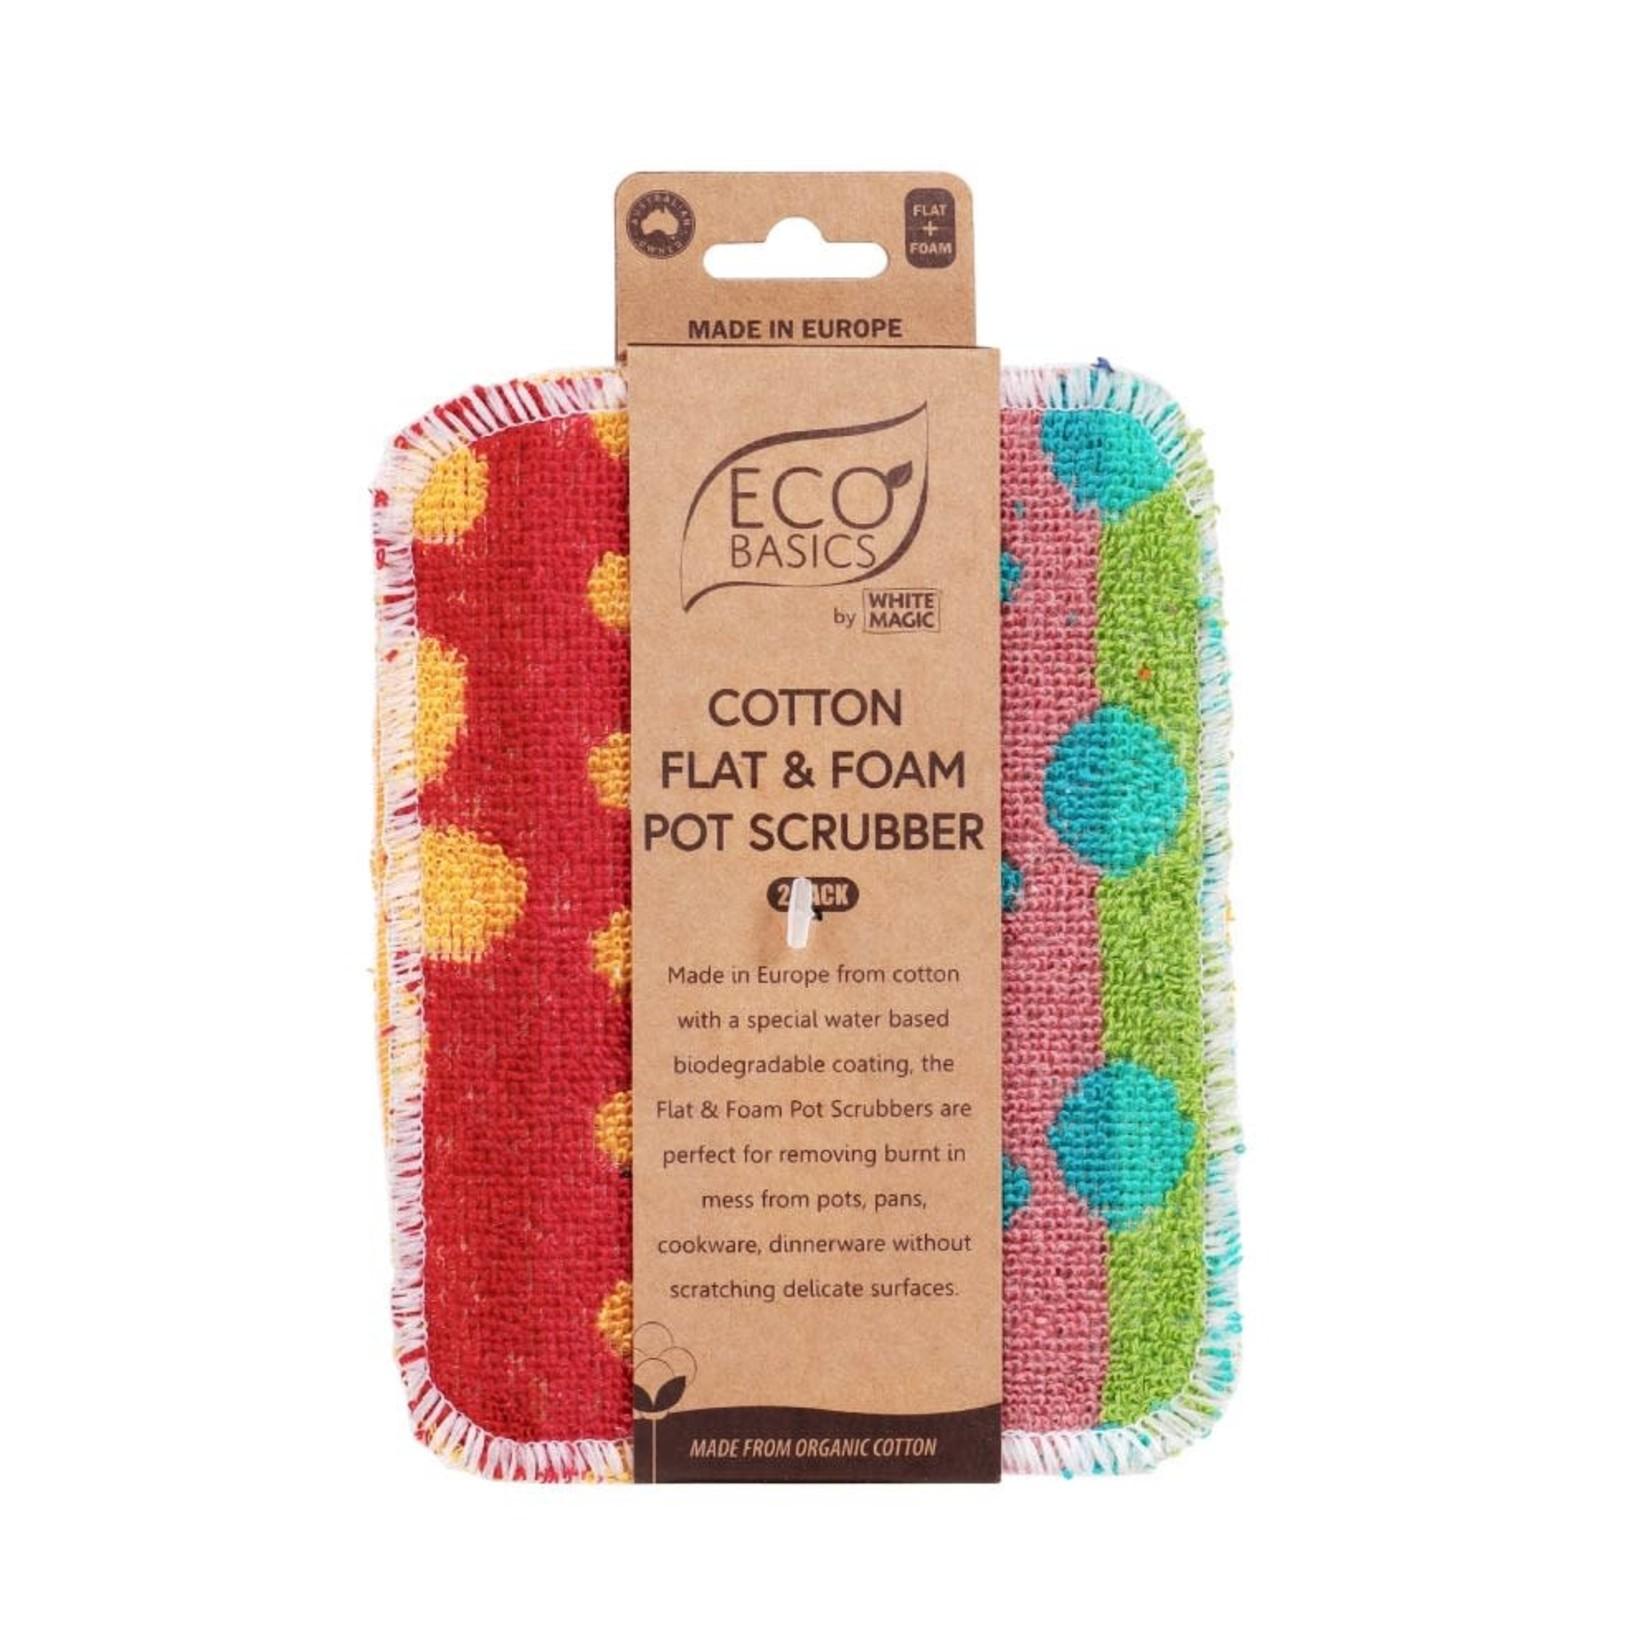 Eco Basics Eco Basics Flat & Foam Pot Scrubber 2pk